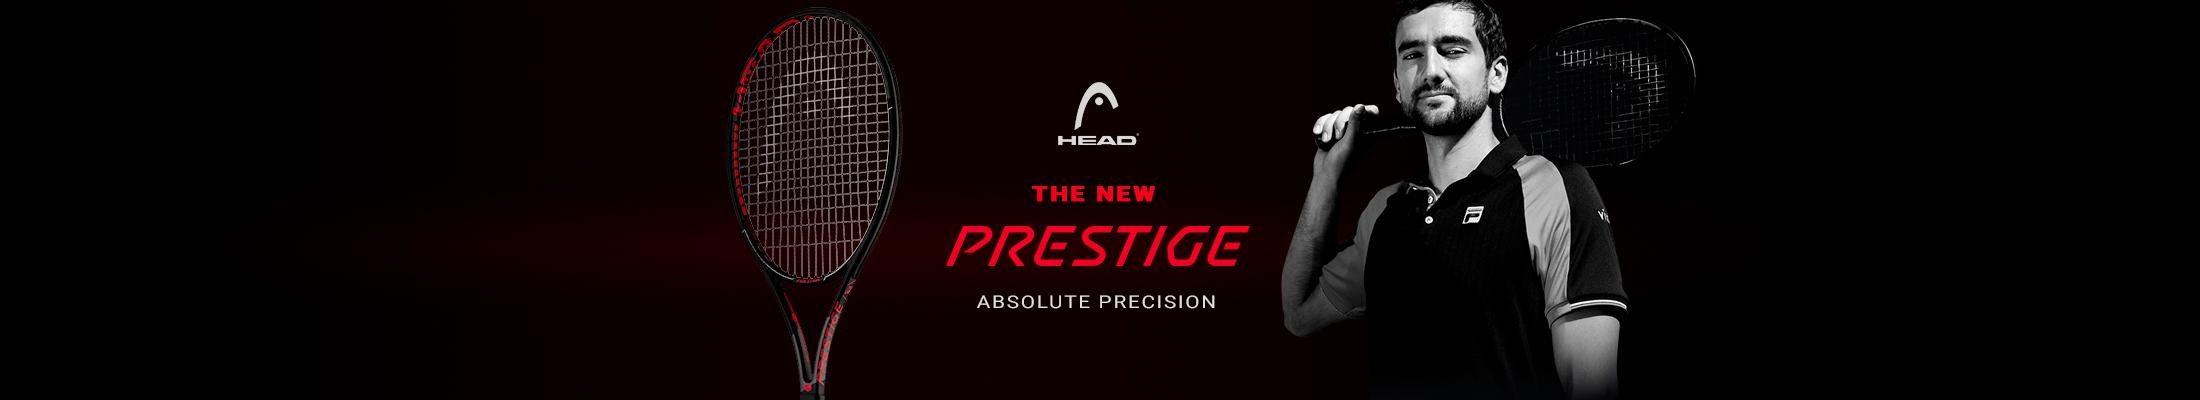 Head Graphene Touch Prestige